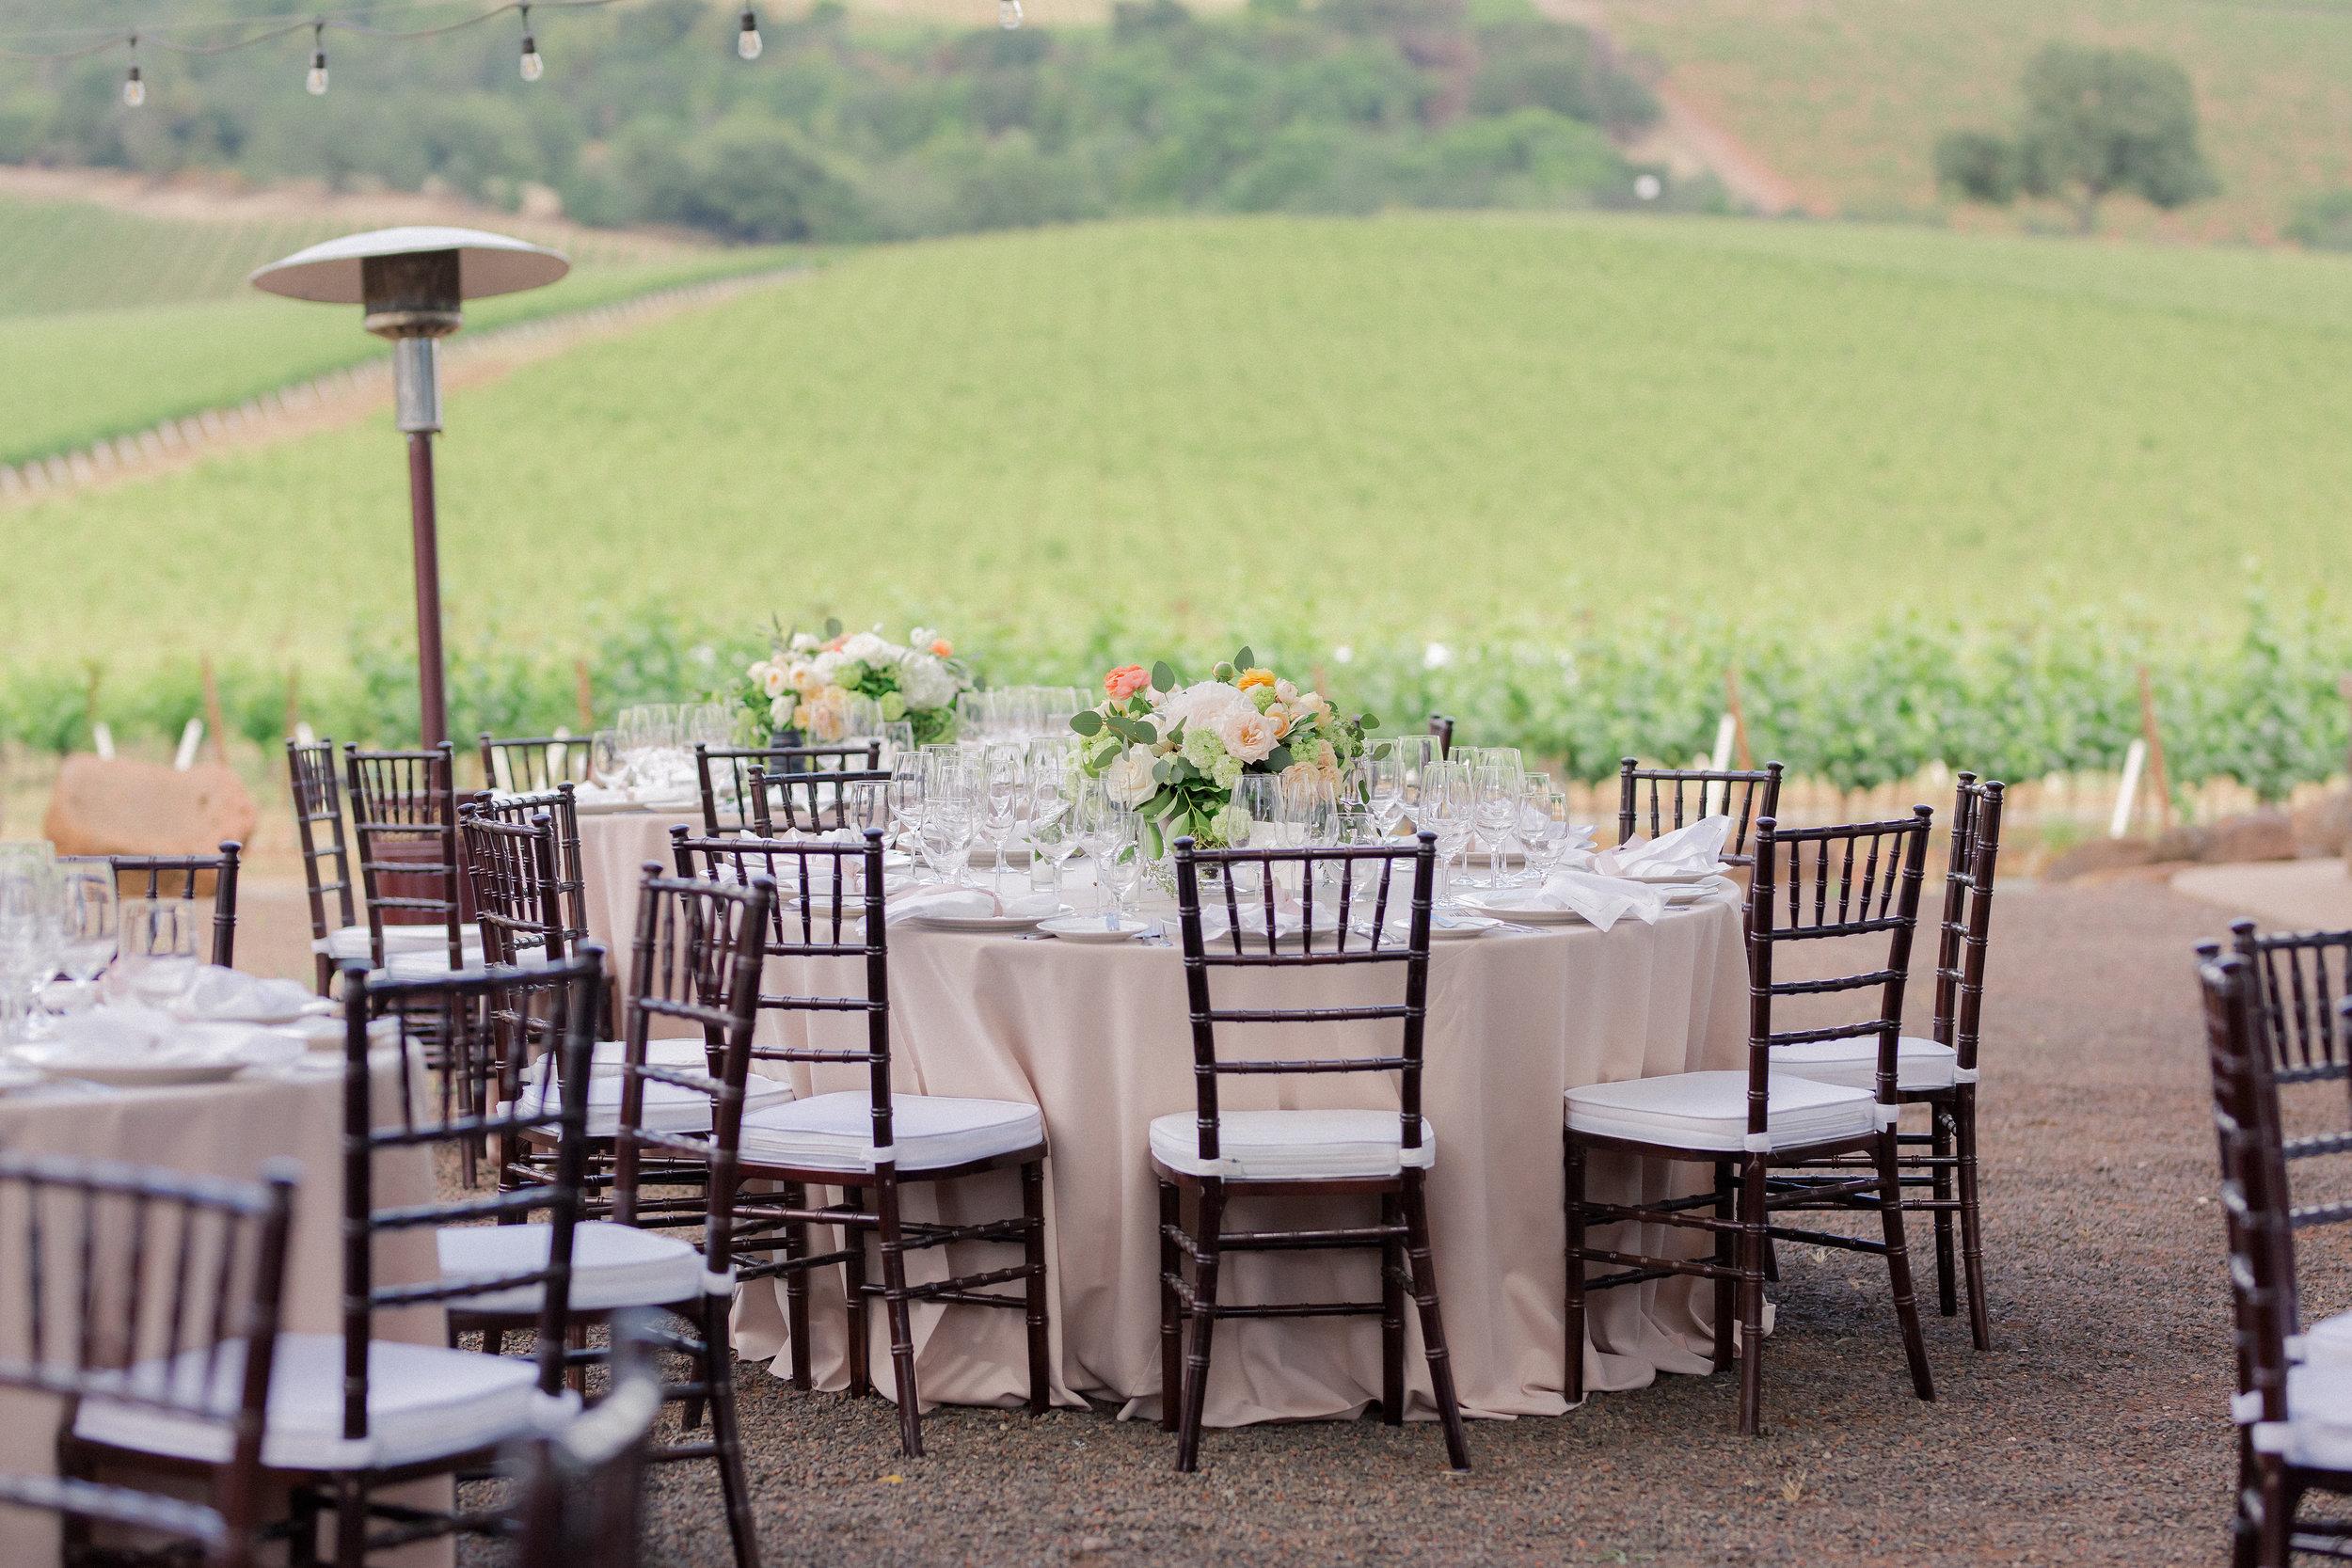 california-wedding-day-lrelyea-events-lori-paladino-photography10.jpg